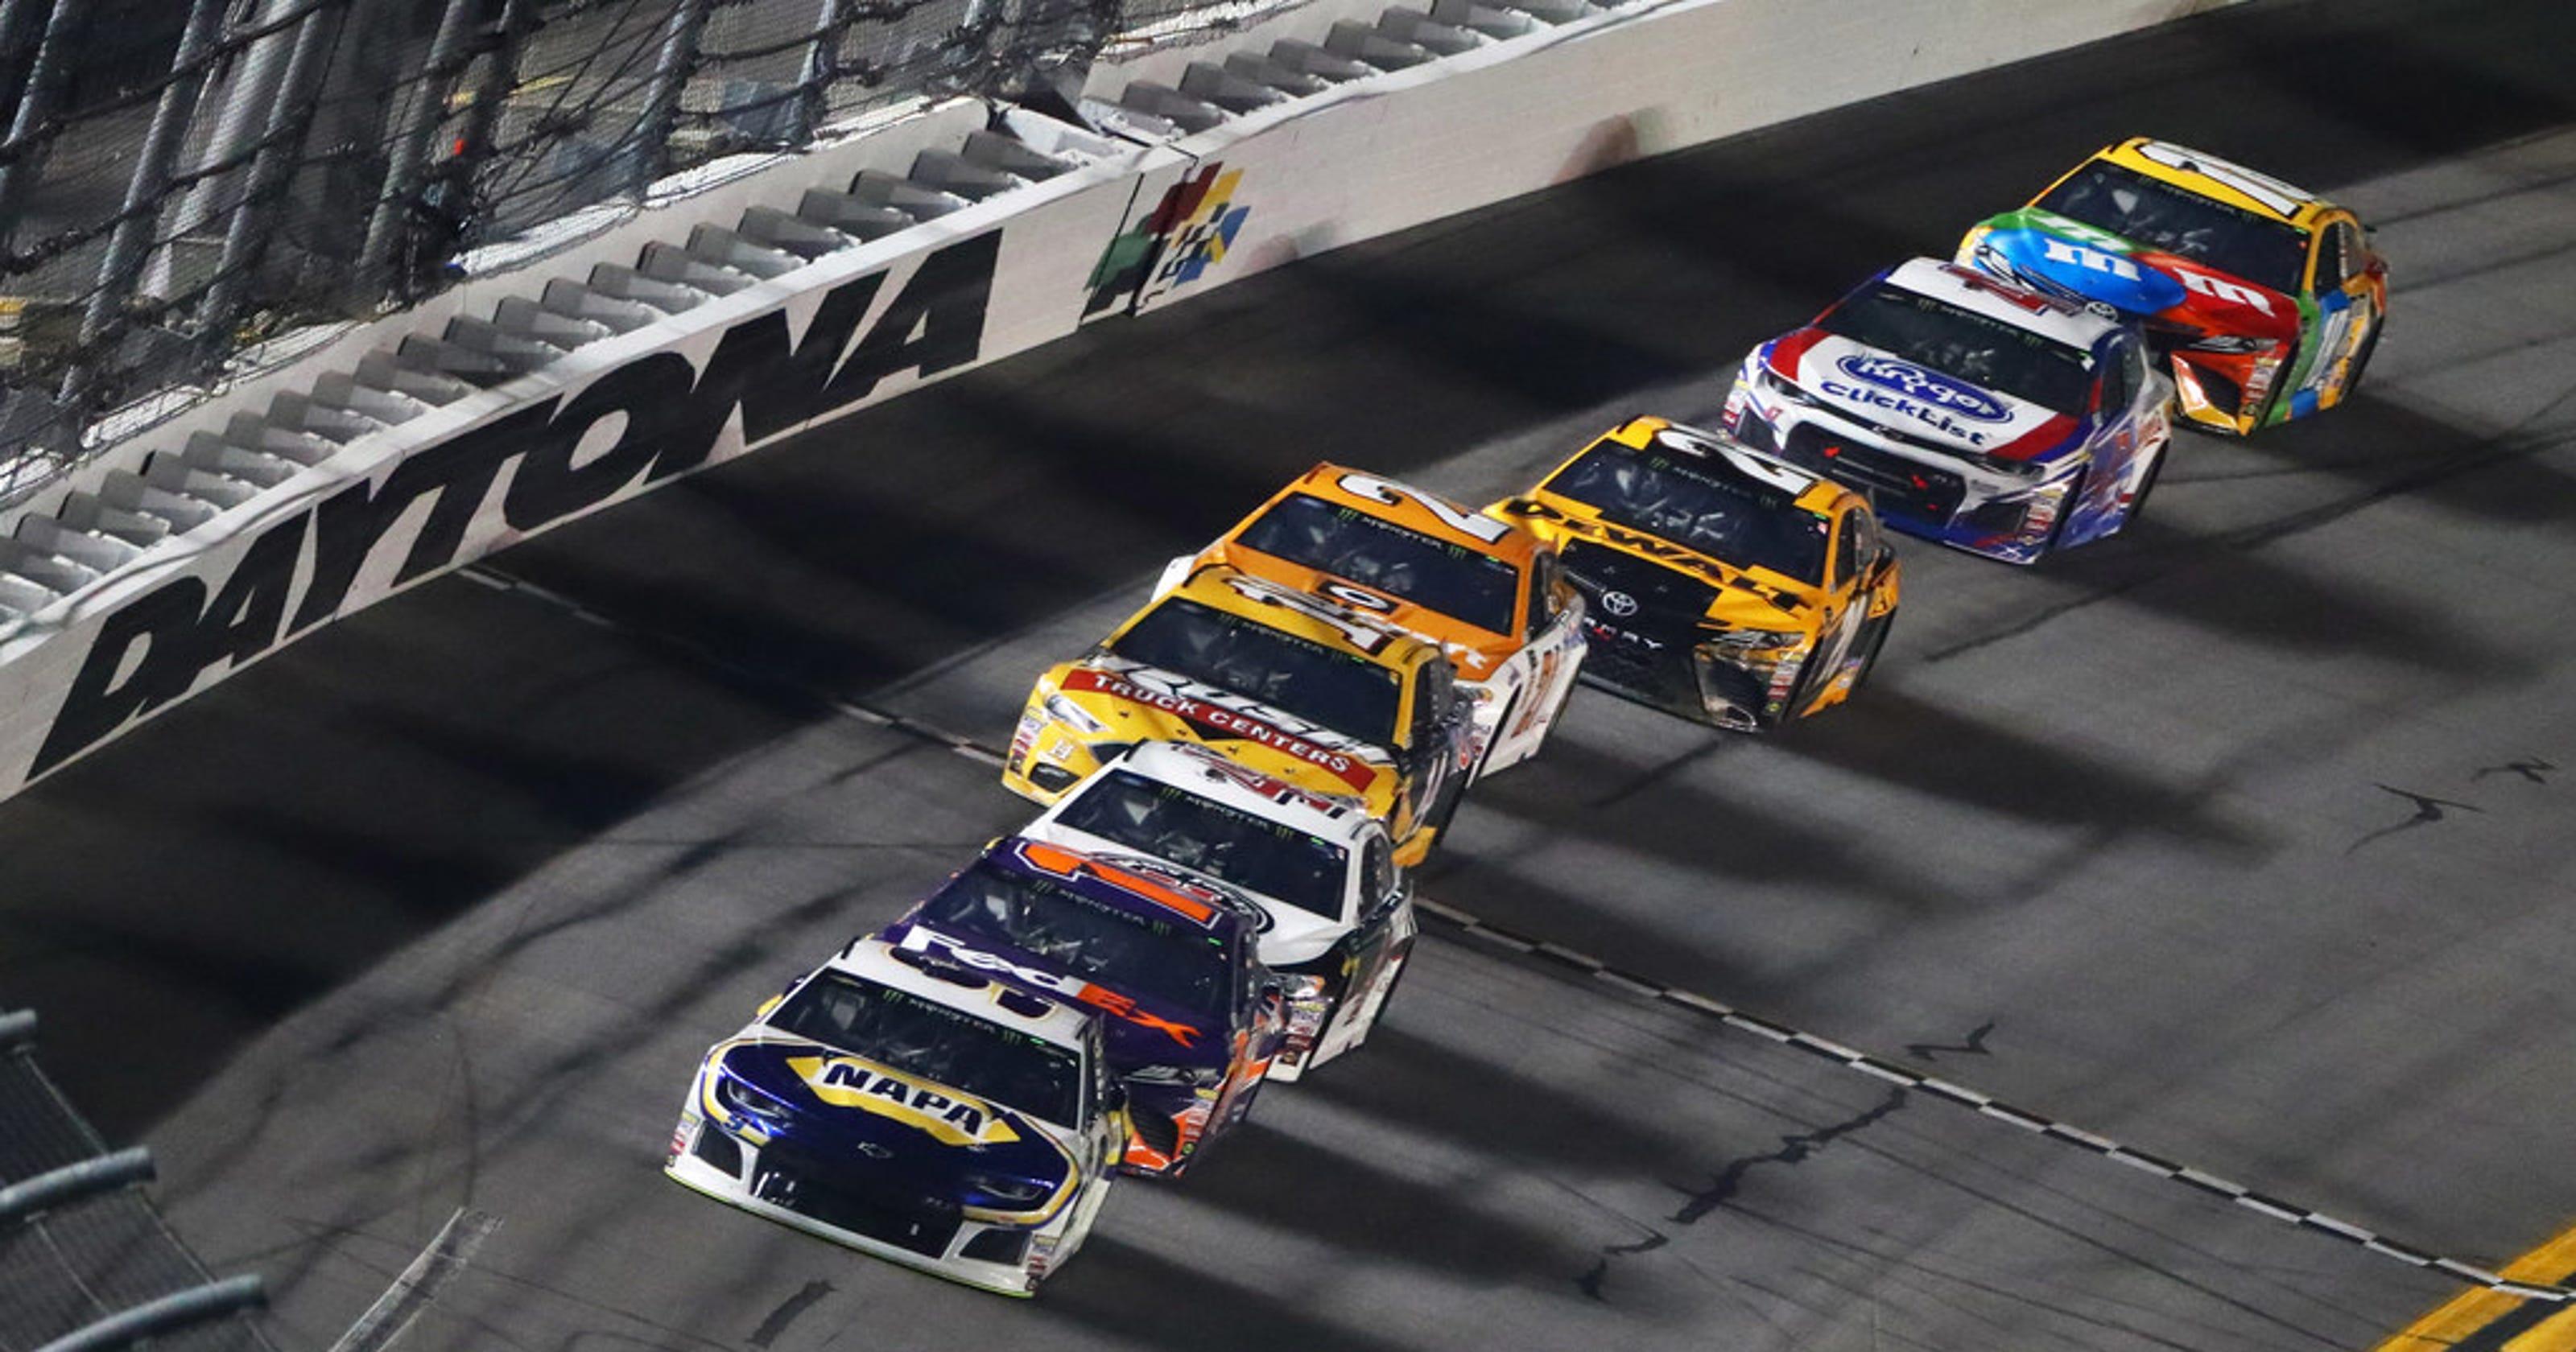 Drivers make final preparations for 60th Daytona 500 on Sunday